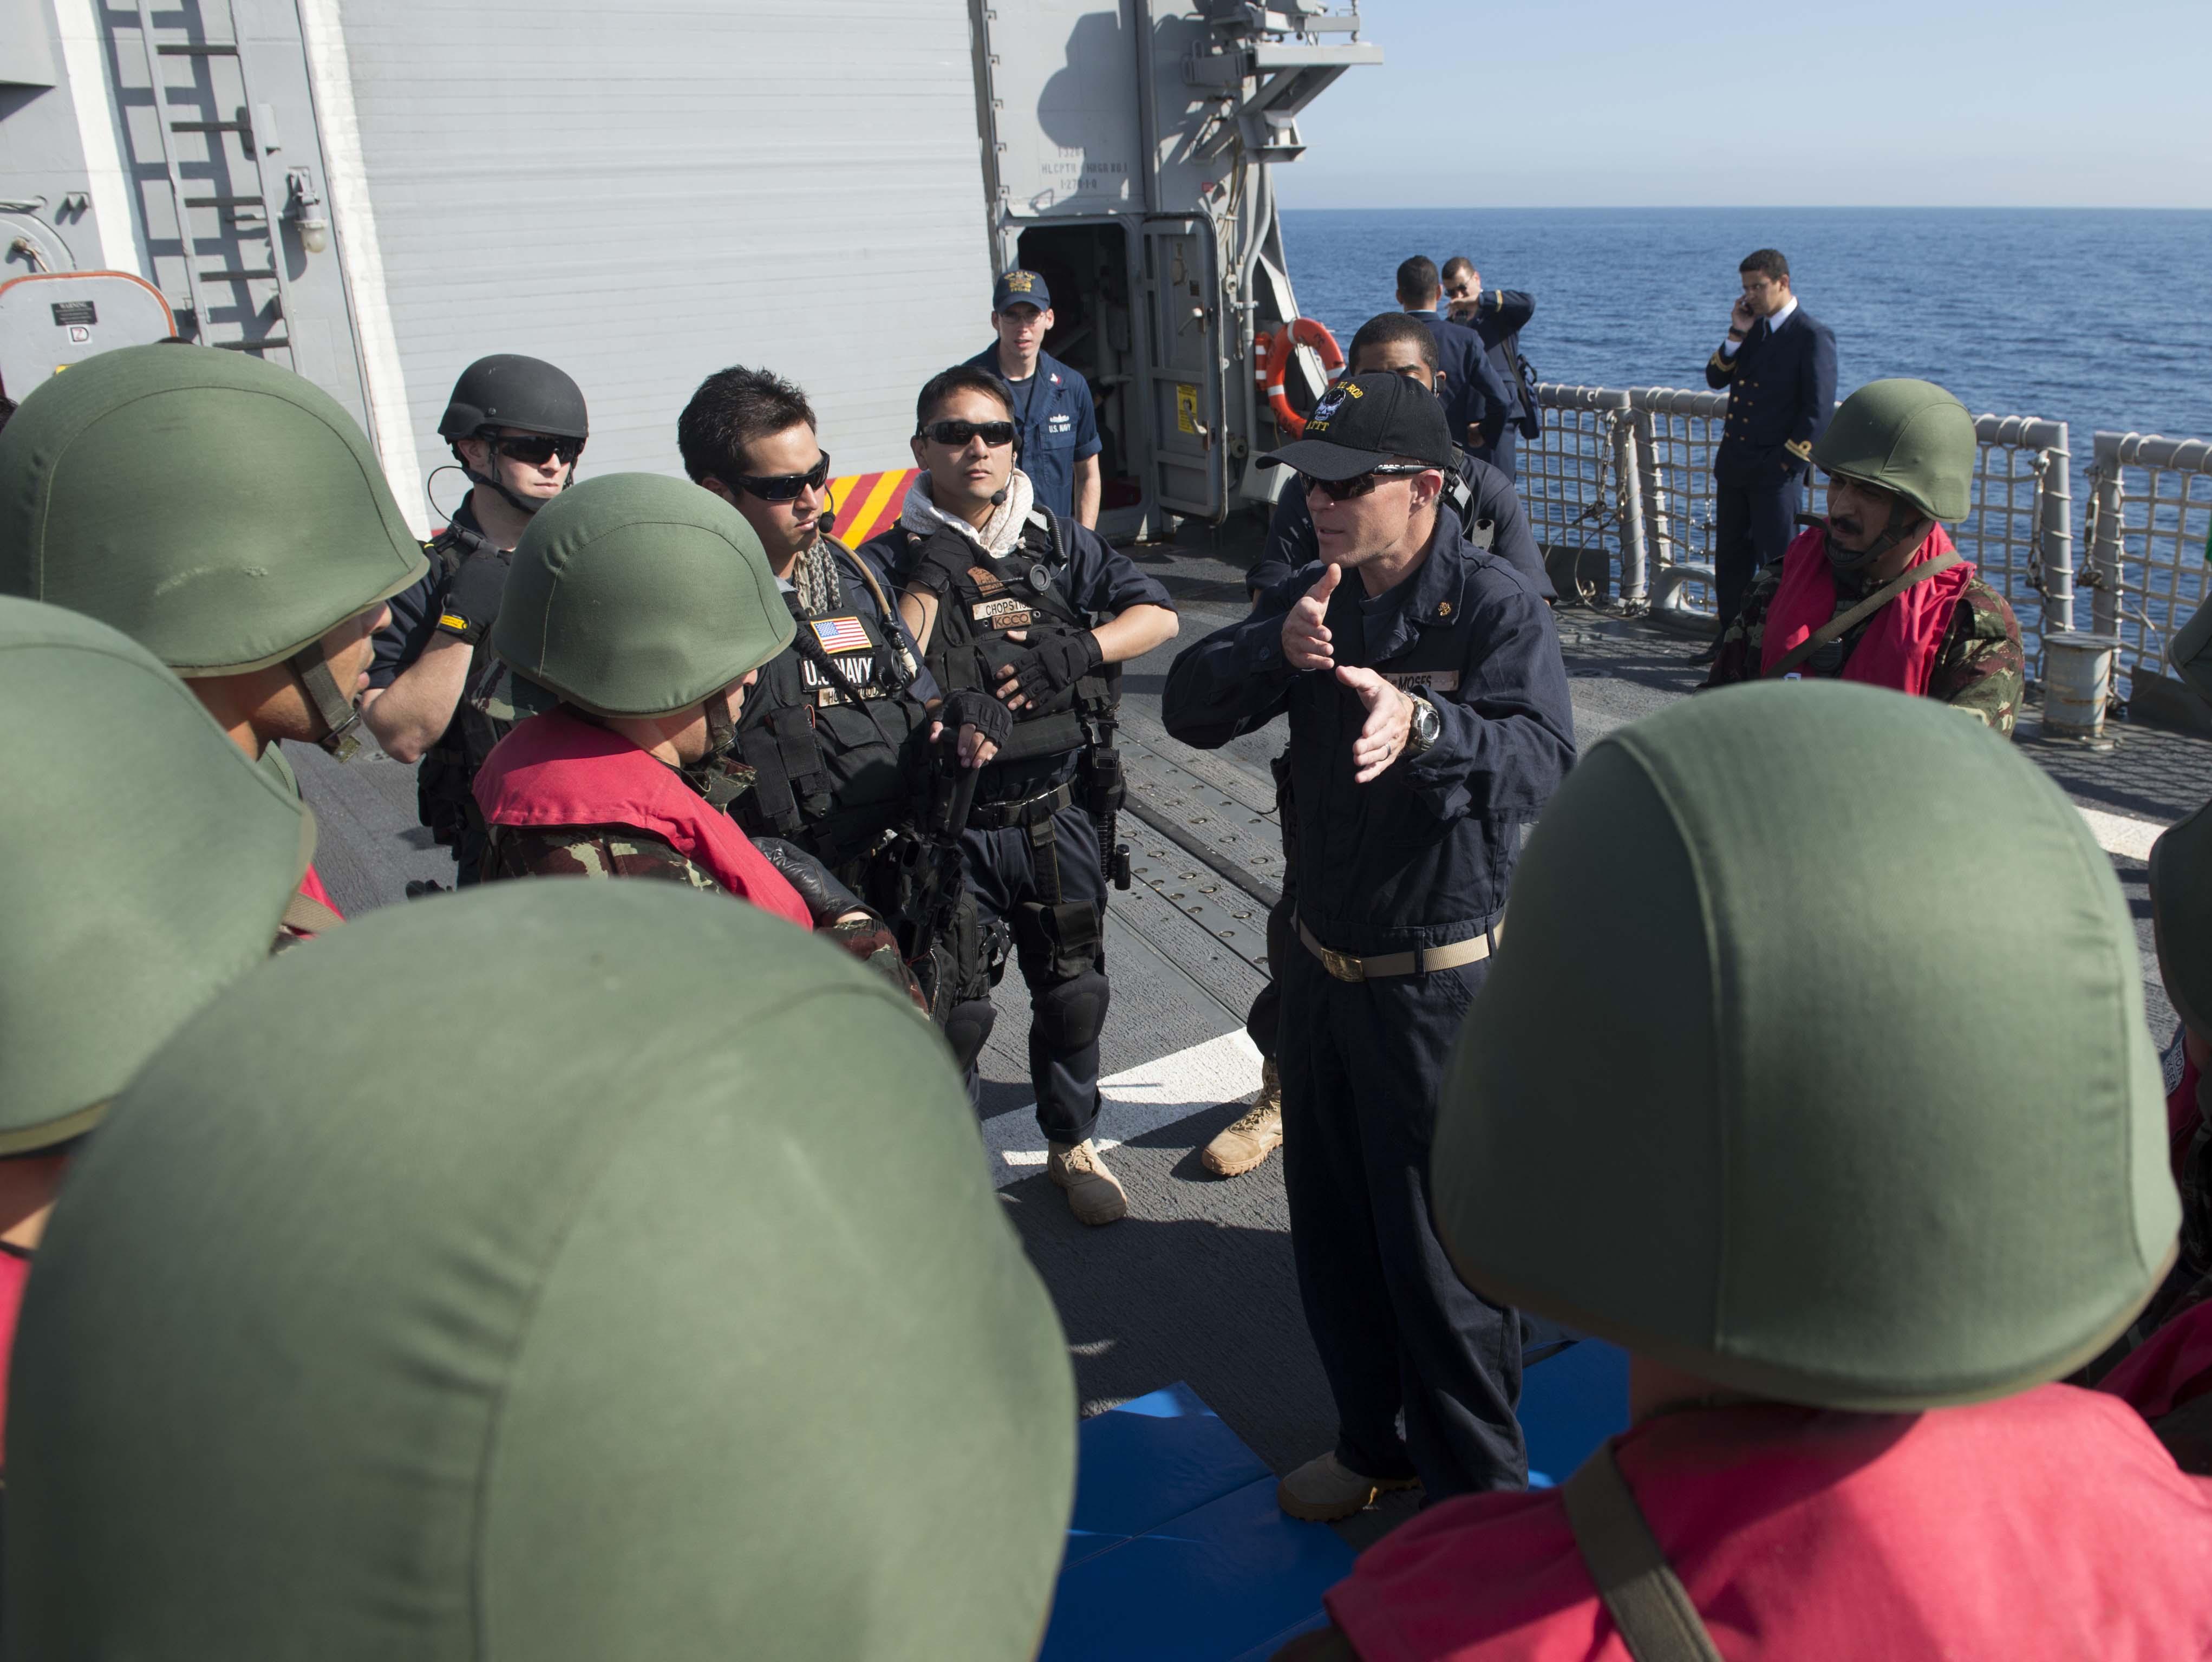 PASSEX 2014-1 ( USS Elrod (FFG55) et RMN Allal Ben Abdellah (615) ) 12363698615_2f23162be9_o